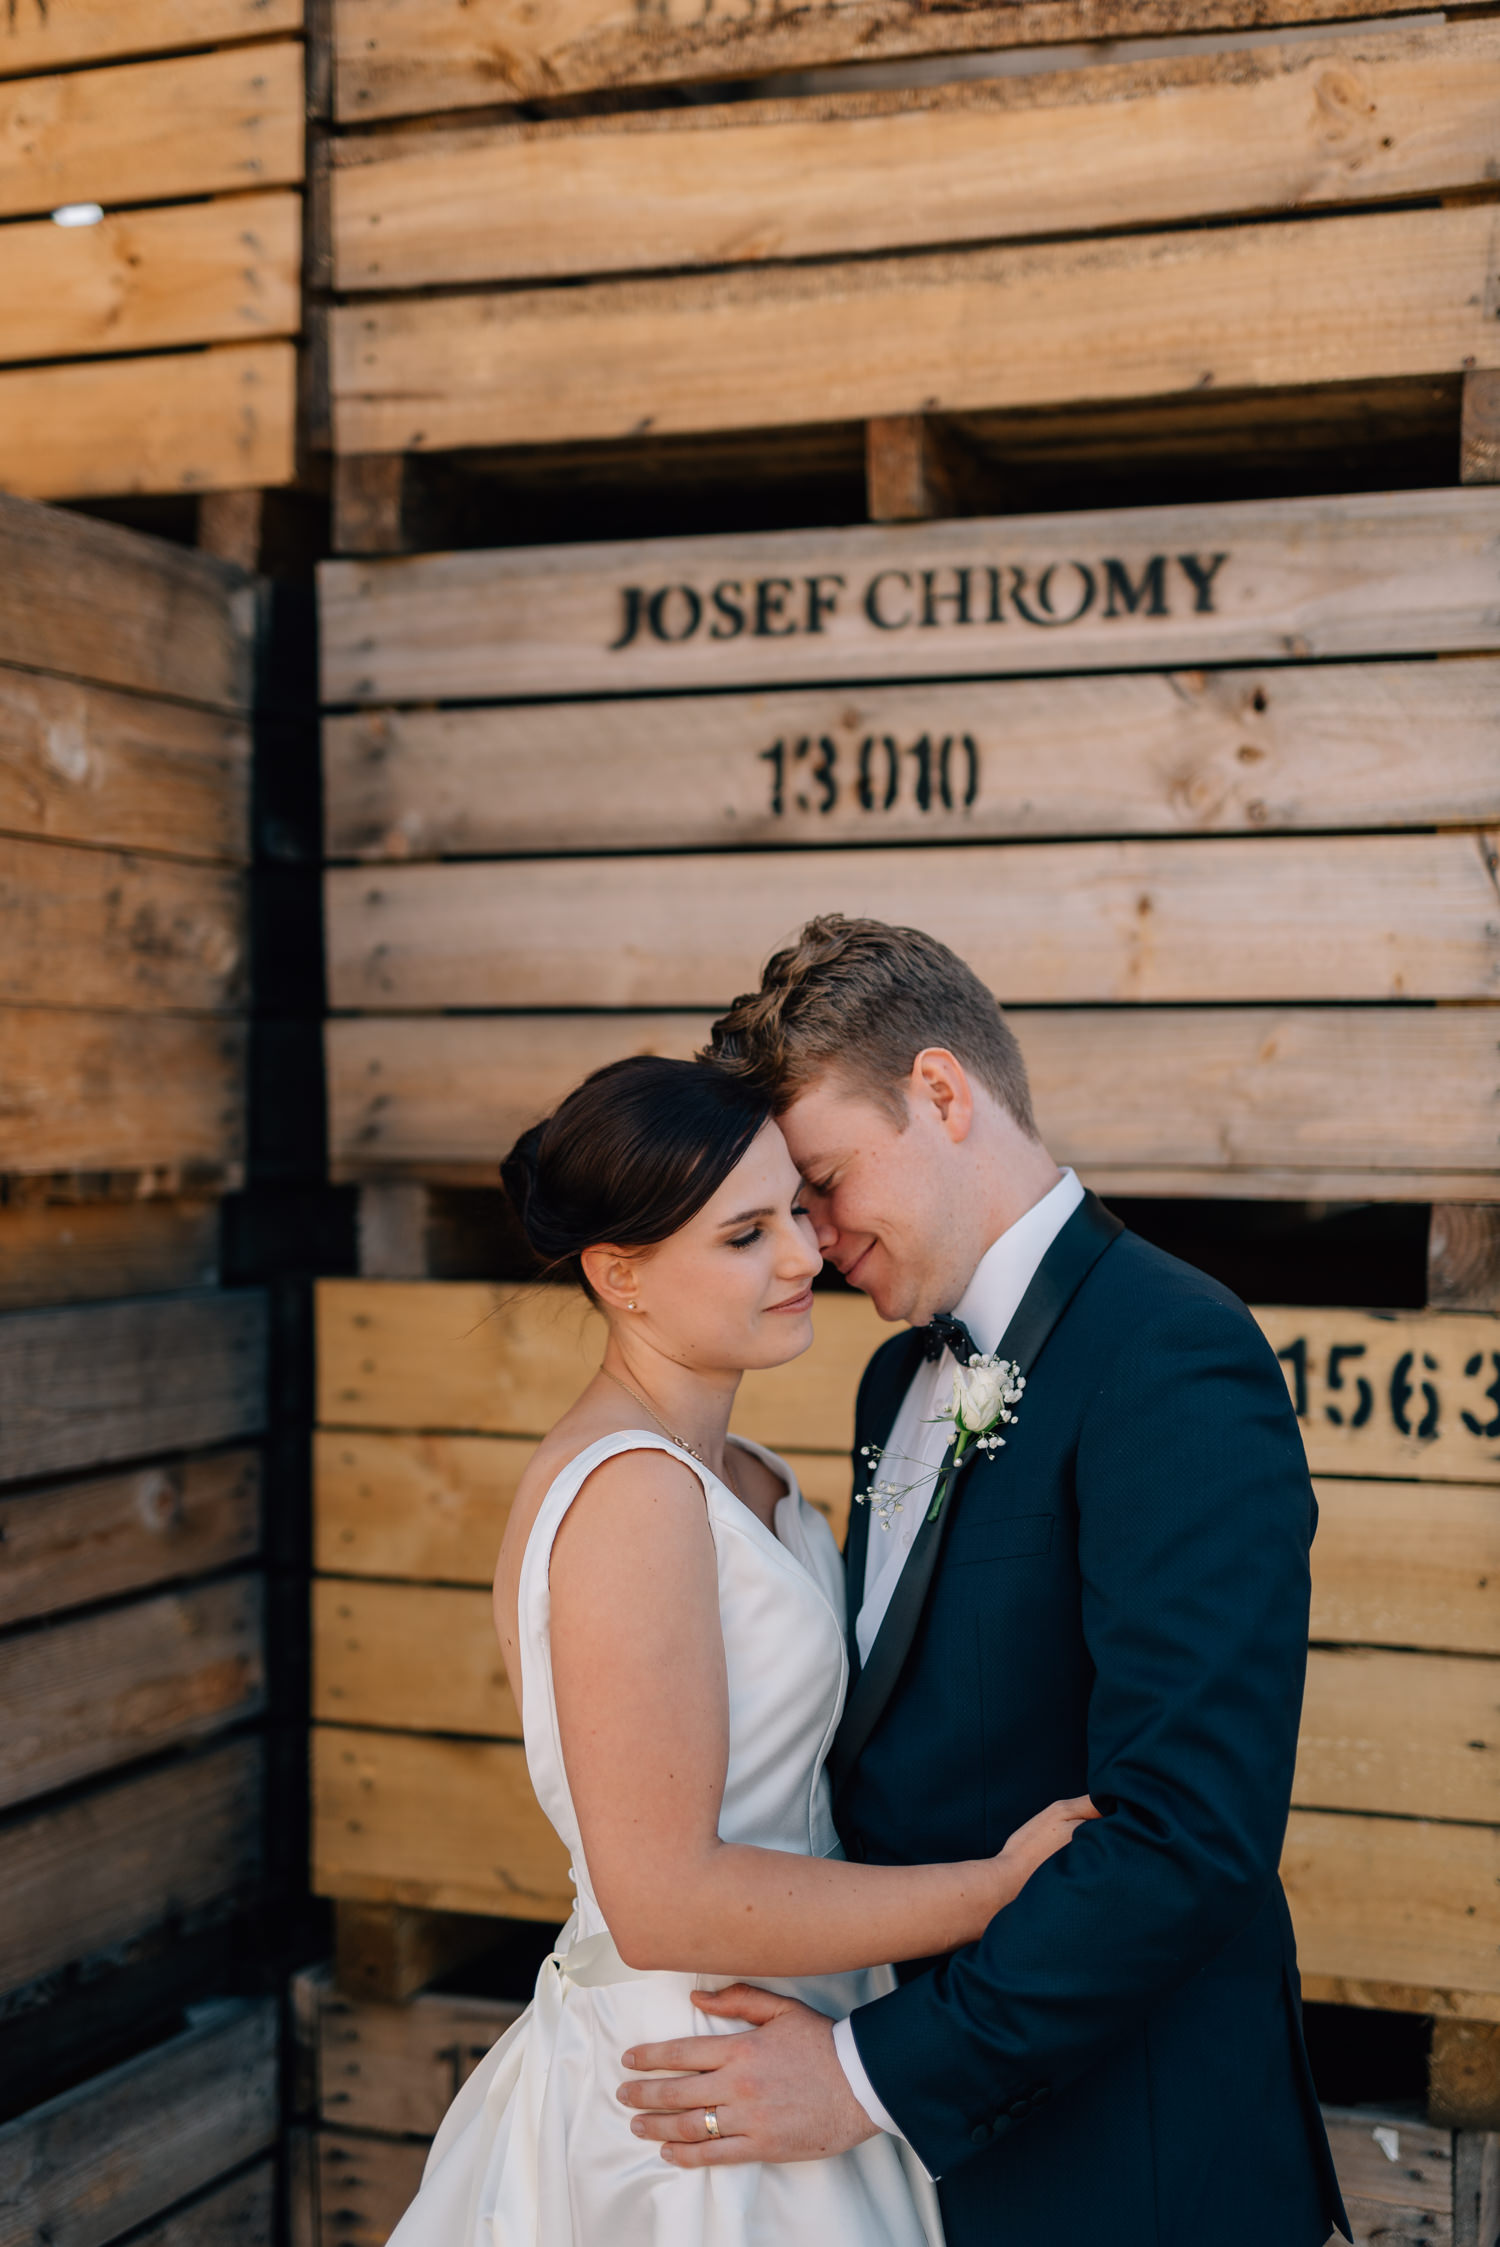 Josef-Chromy-Wedding-Photographer-62.jpg